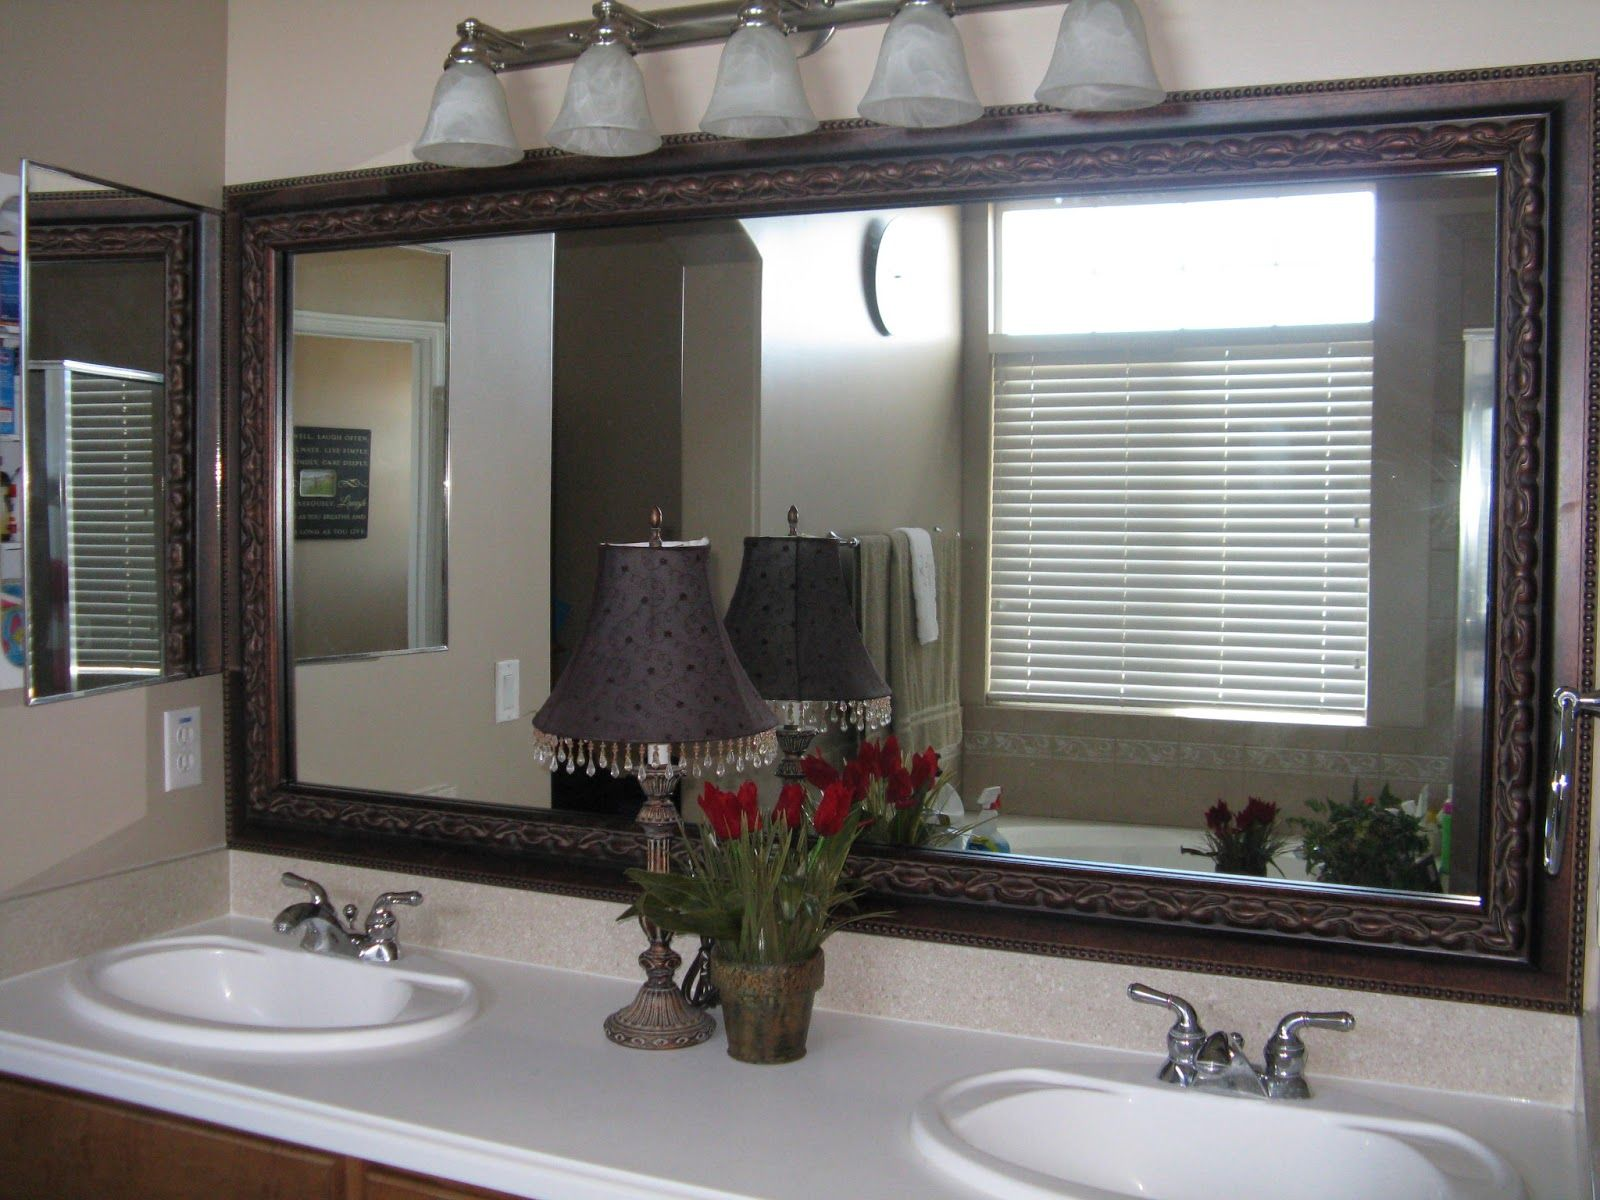 Bathroom mirror frames kits stylish framed bathroom mirrors home mirror frame kit bathroom mirror frame most popular frame styles solutioingenieria Images